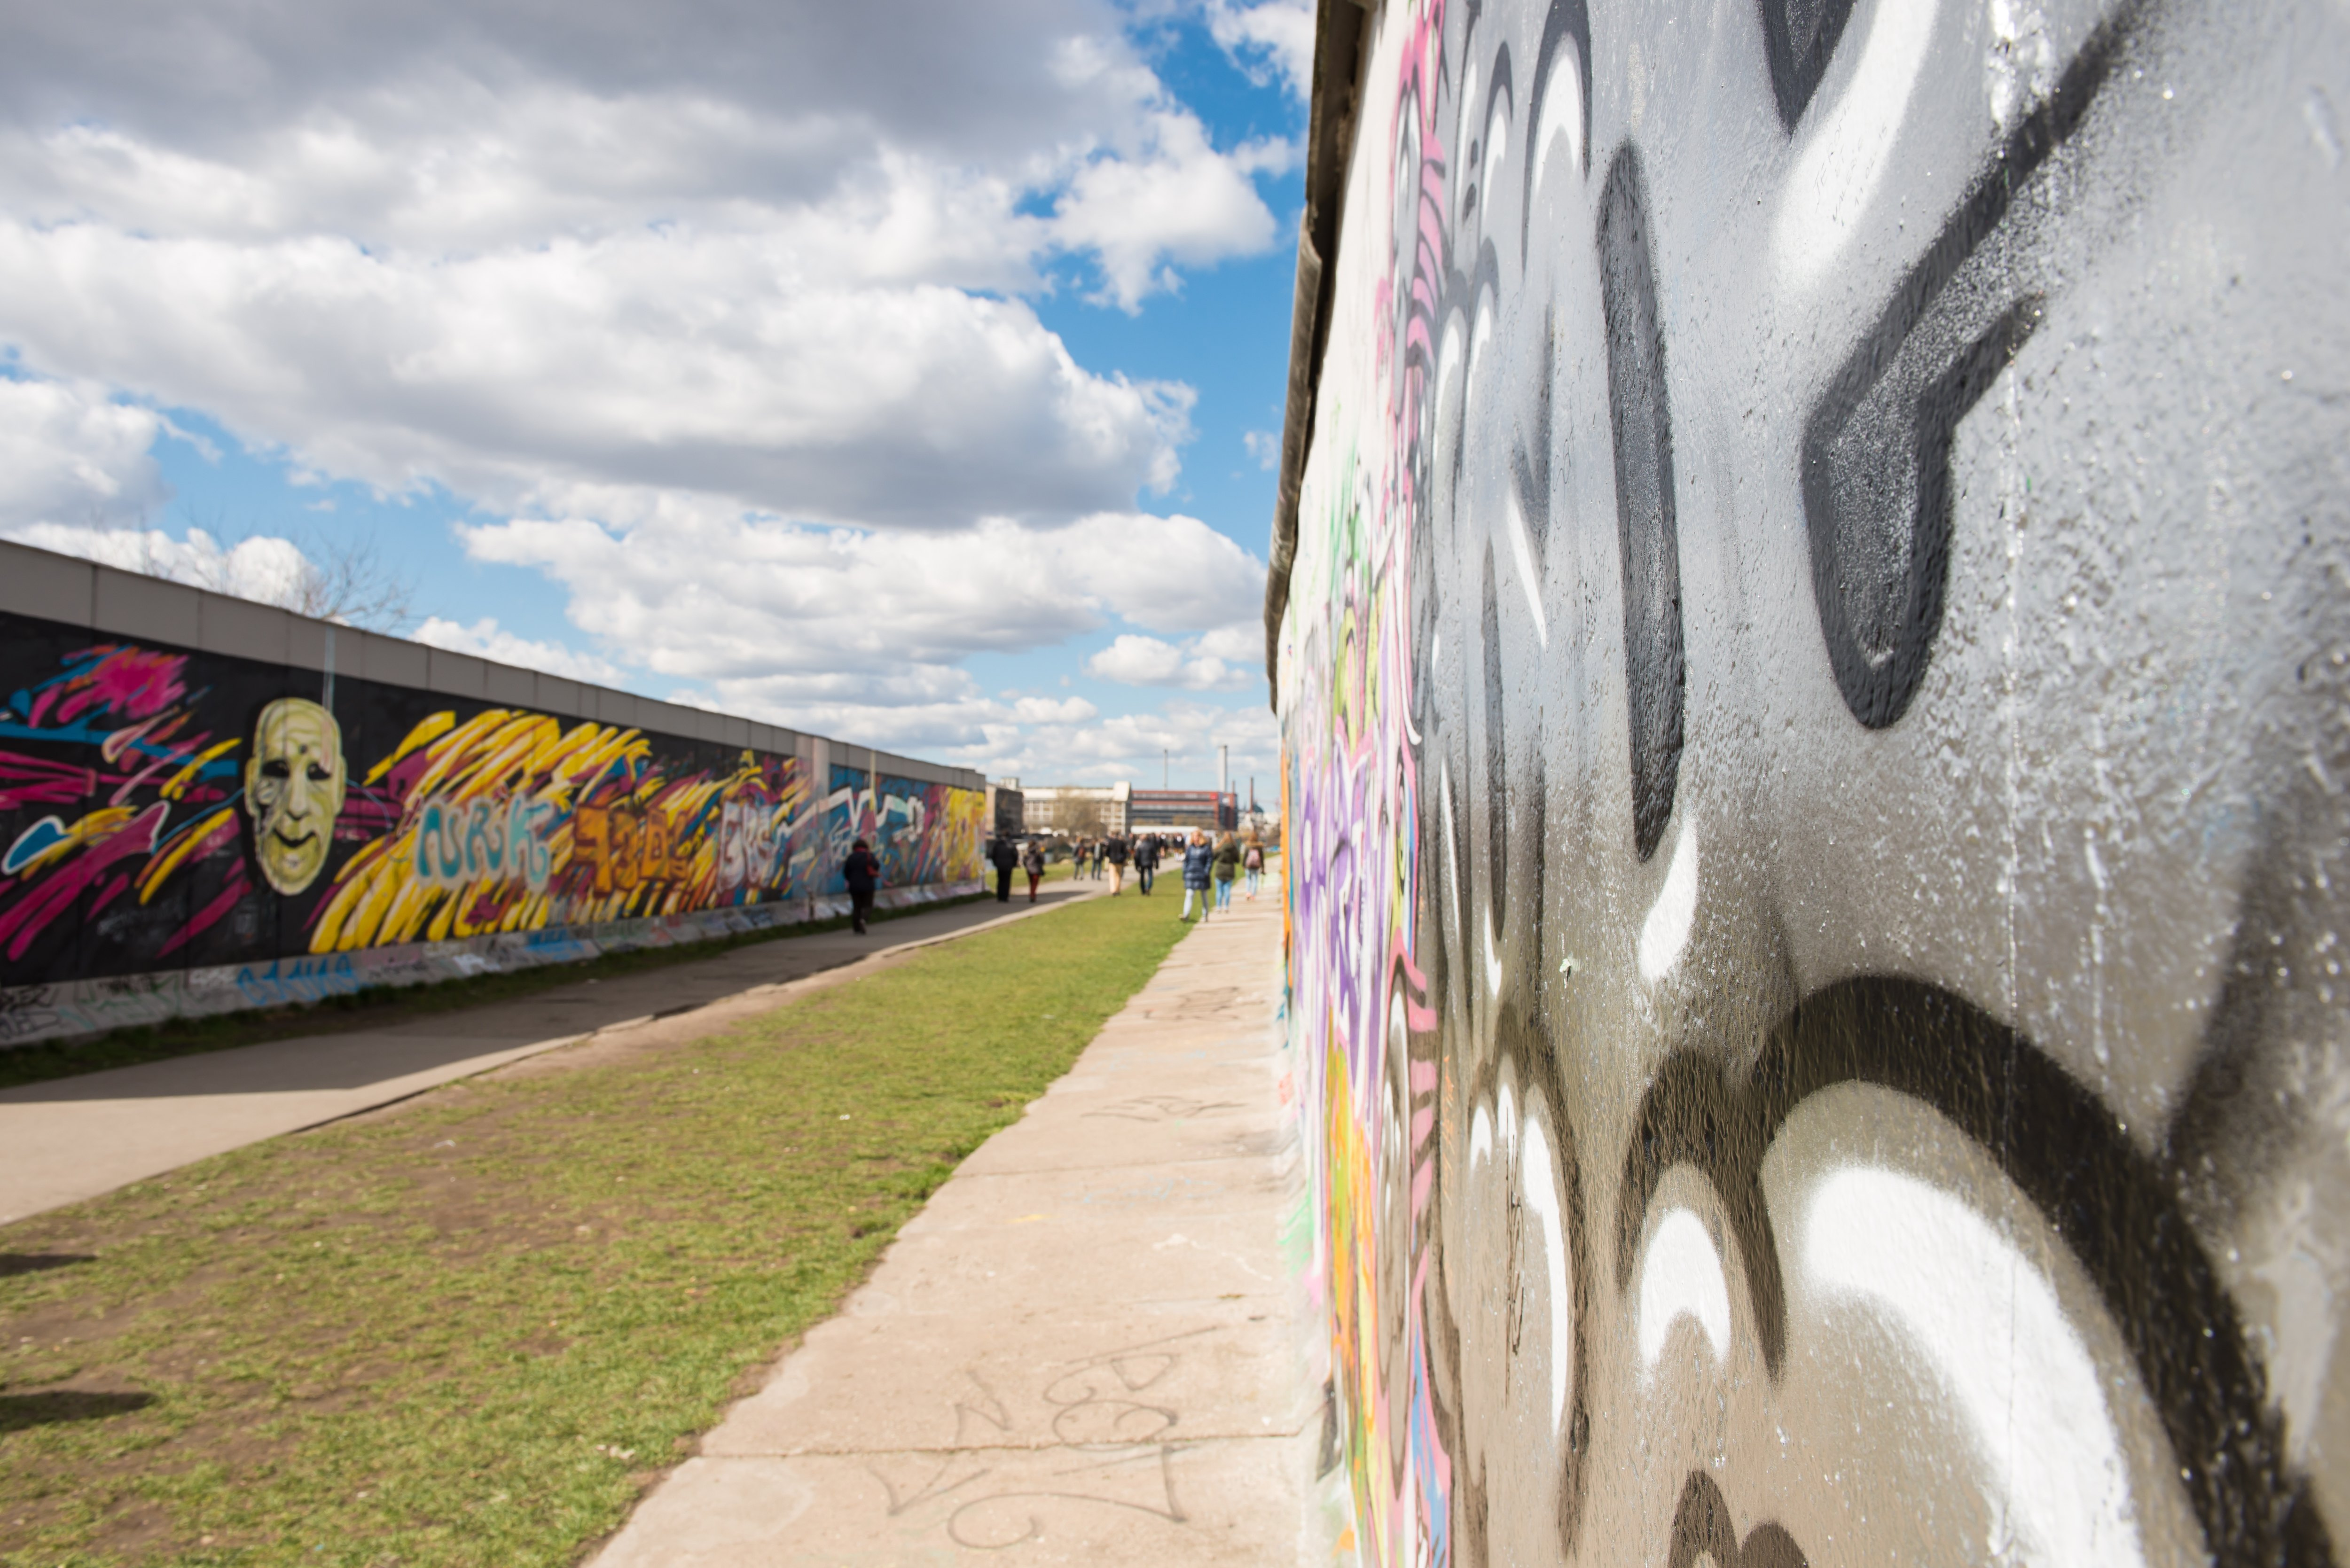 柏林墙遗址纪念公园  Berlin Wall Memorial   -2